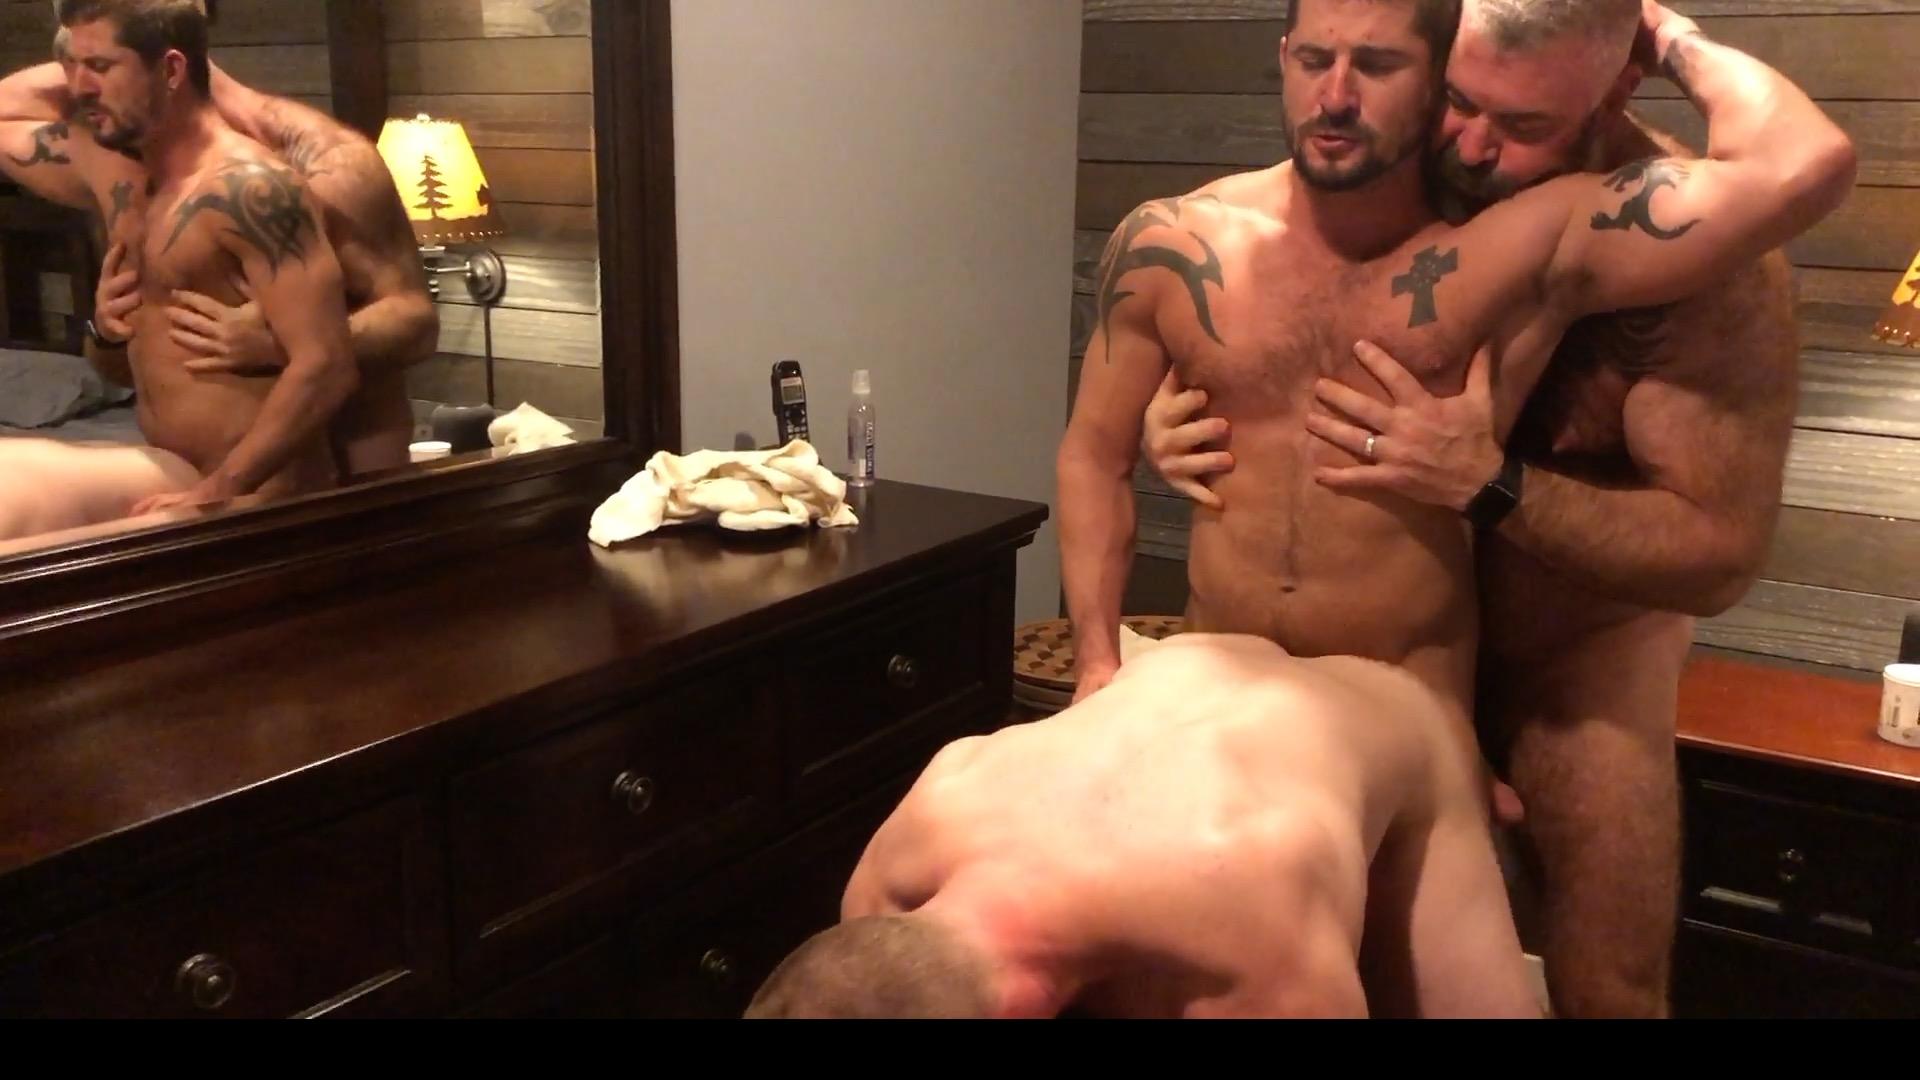 Bear Porn porn inspector review — guiding you to worthy porn